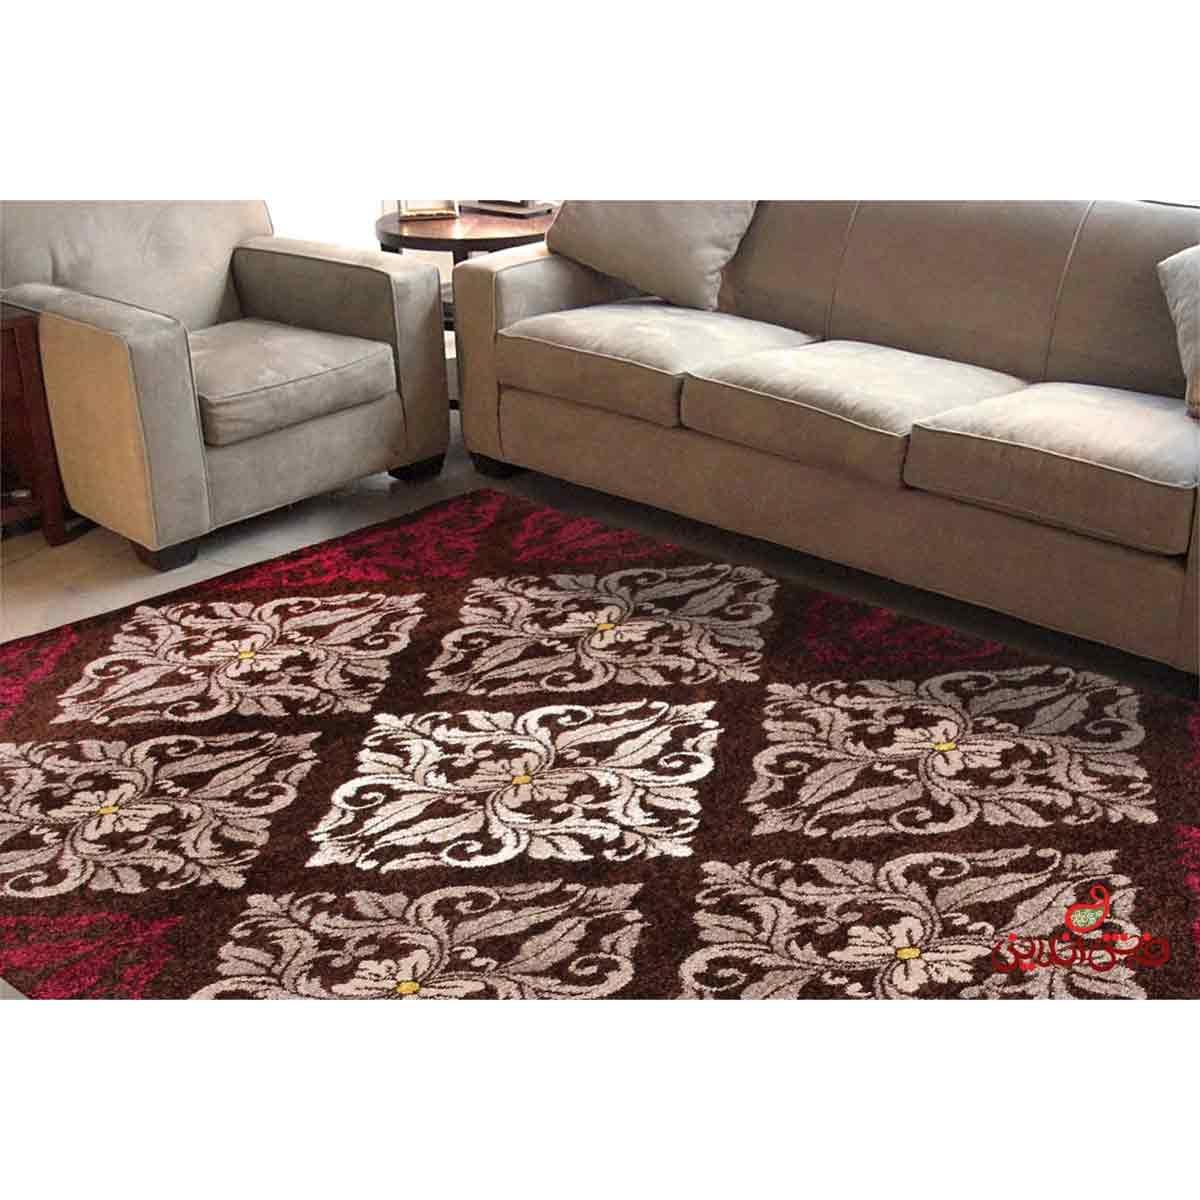 فرش ماشینی  ساوین طرح کرانه قهوه ای